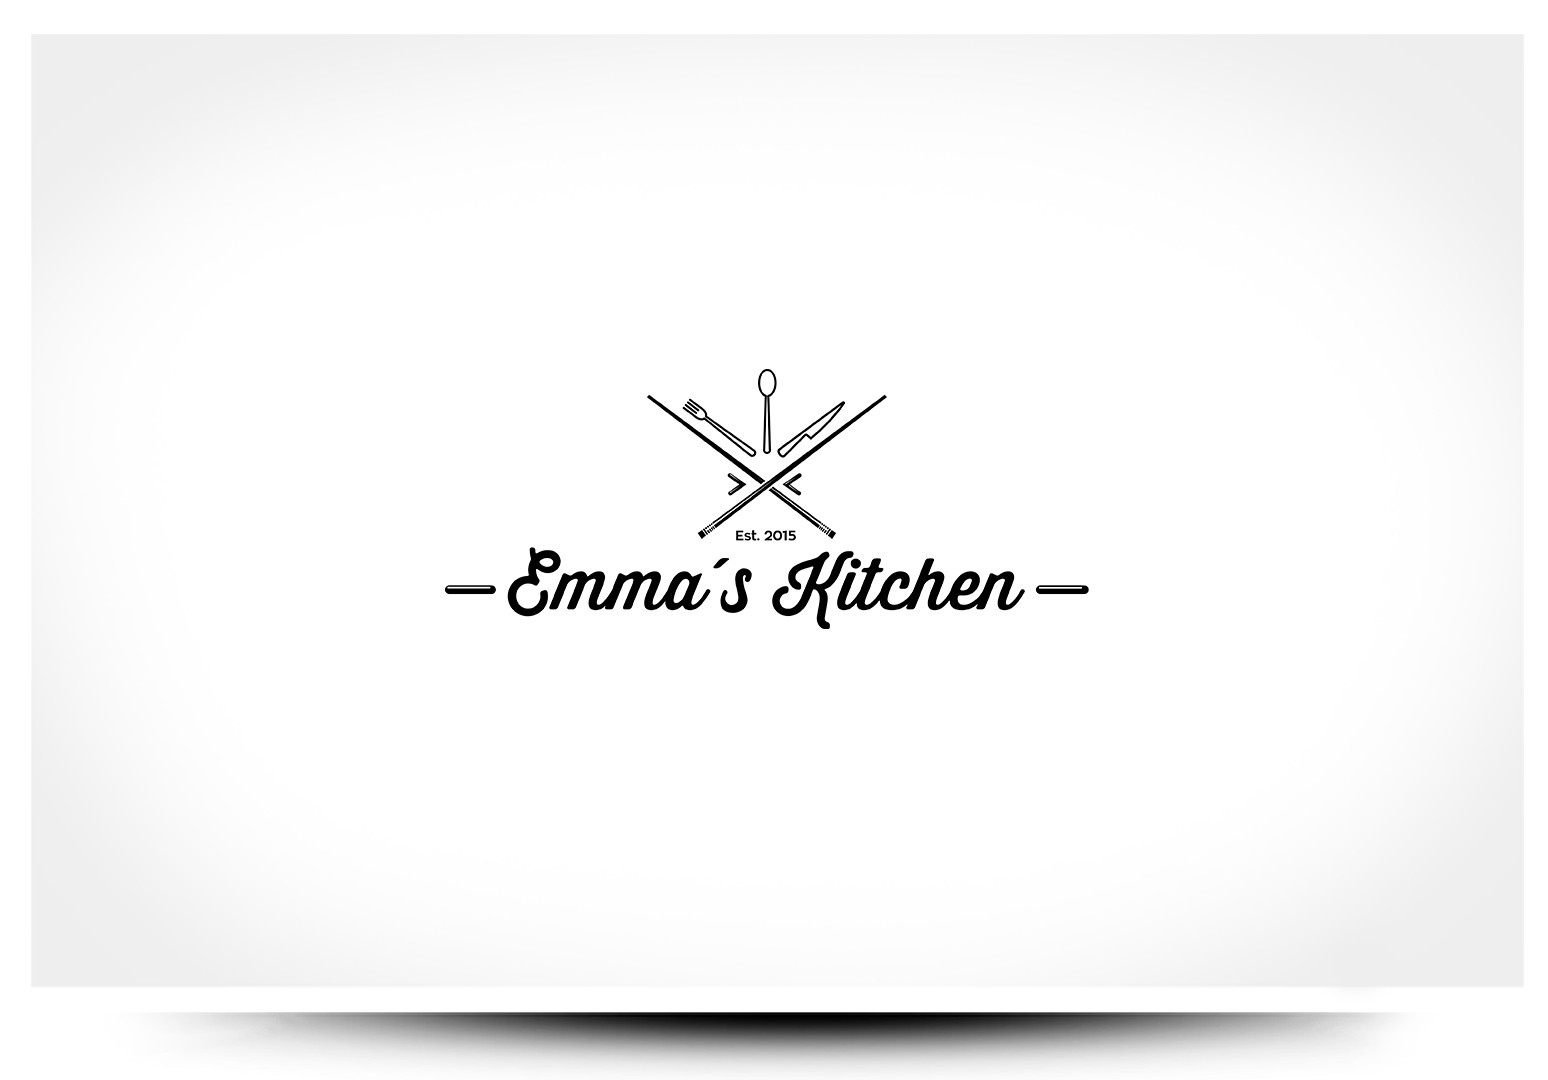 Emma's Kitchen Logo up for grabs!